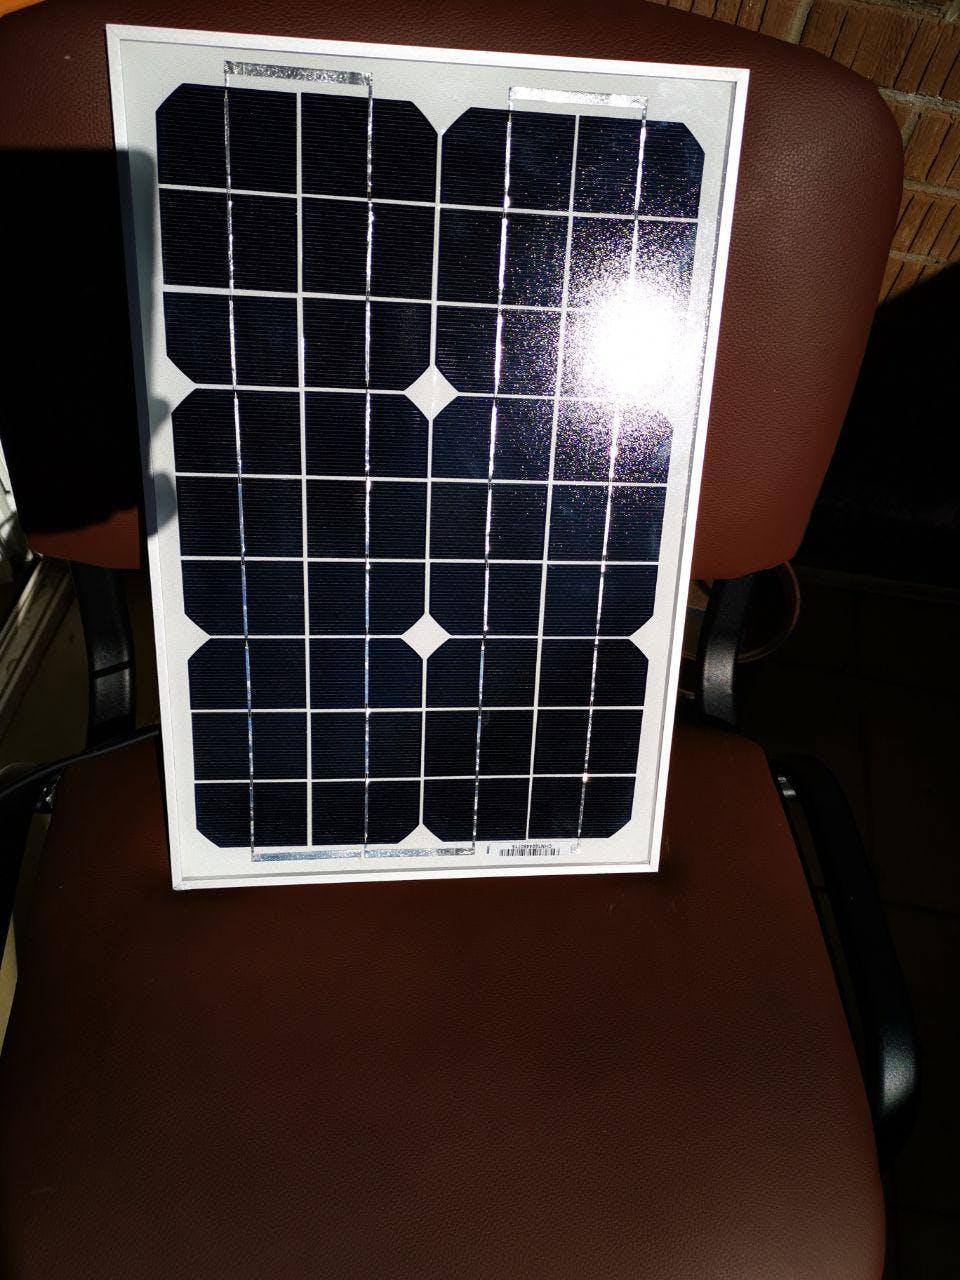 The solar panel. Look #3